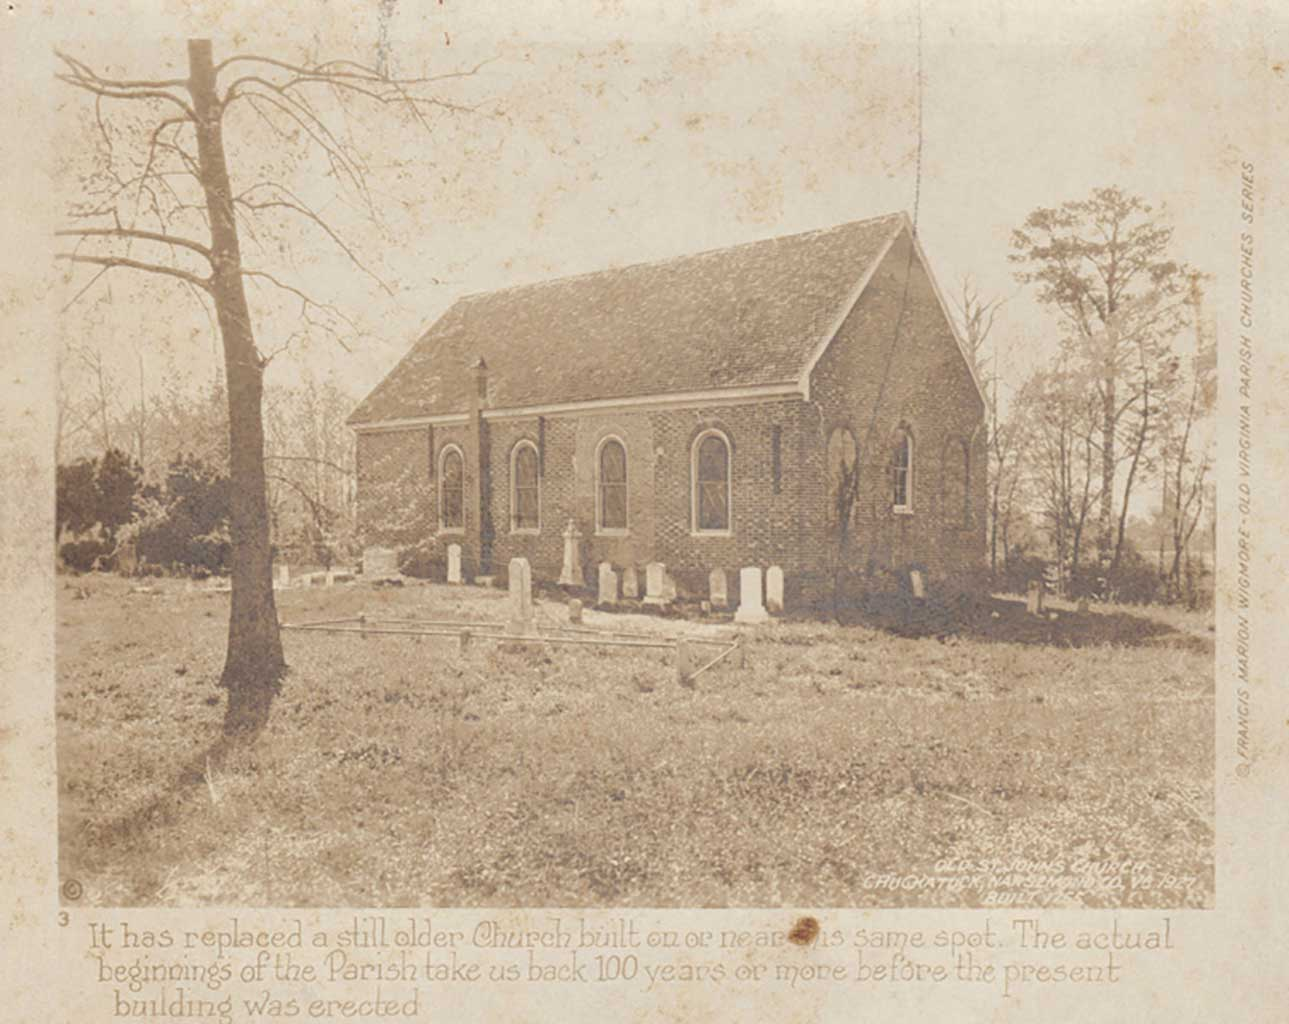 st-johns-church-image1-2